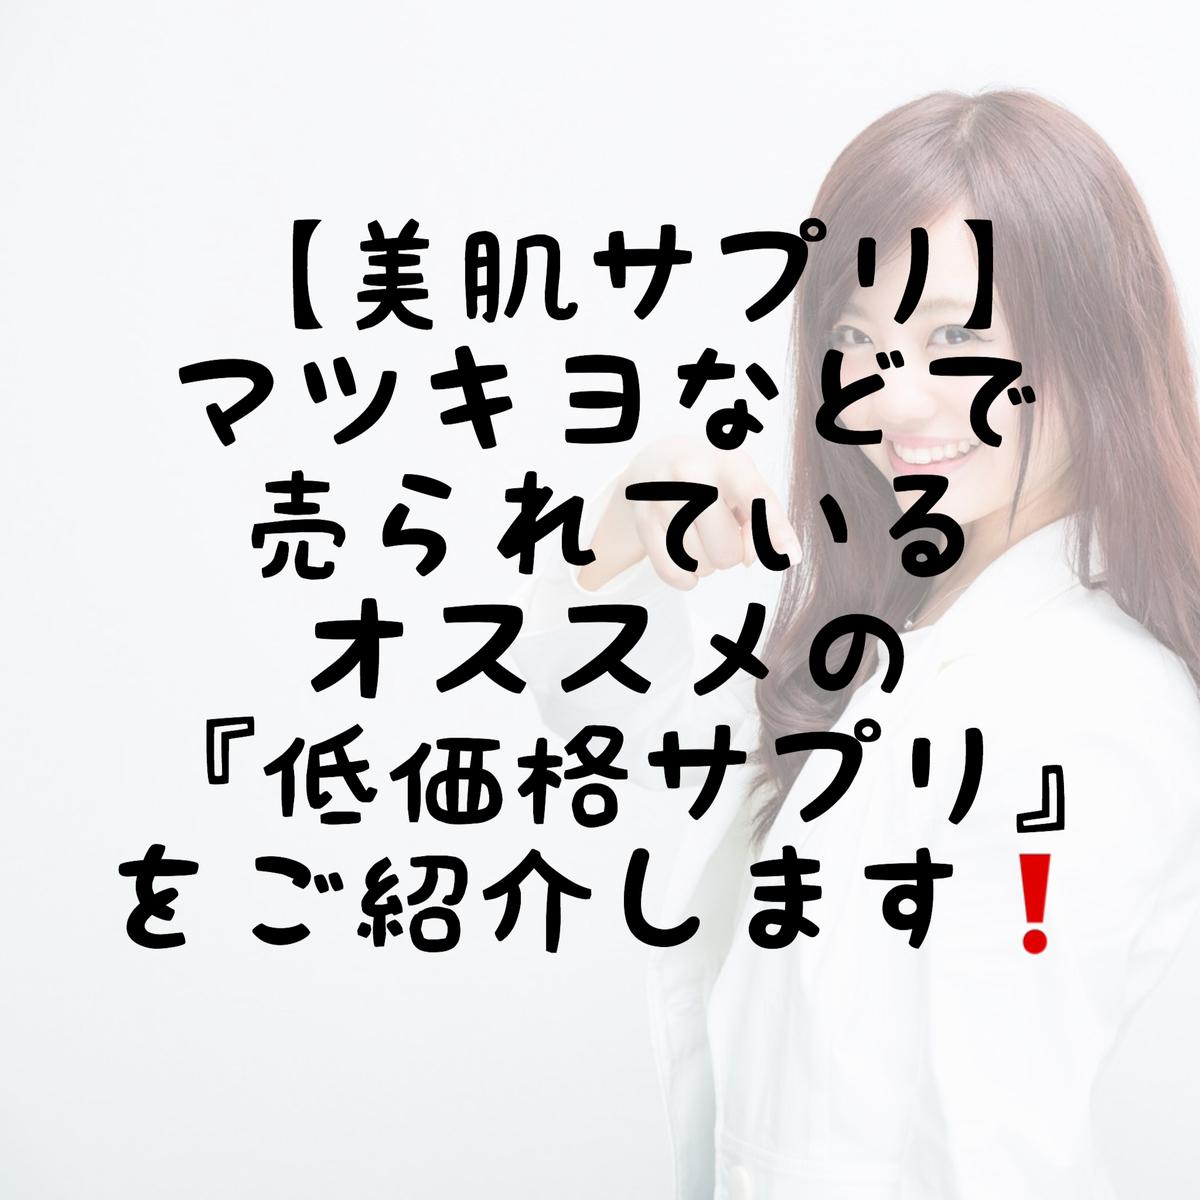 f:id:nokonoko_o:20200531144206j:plain